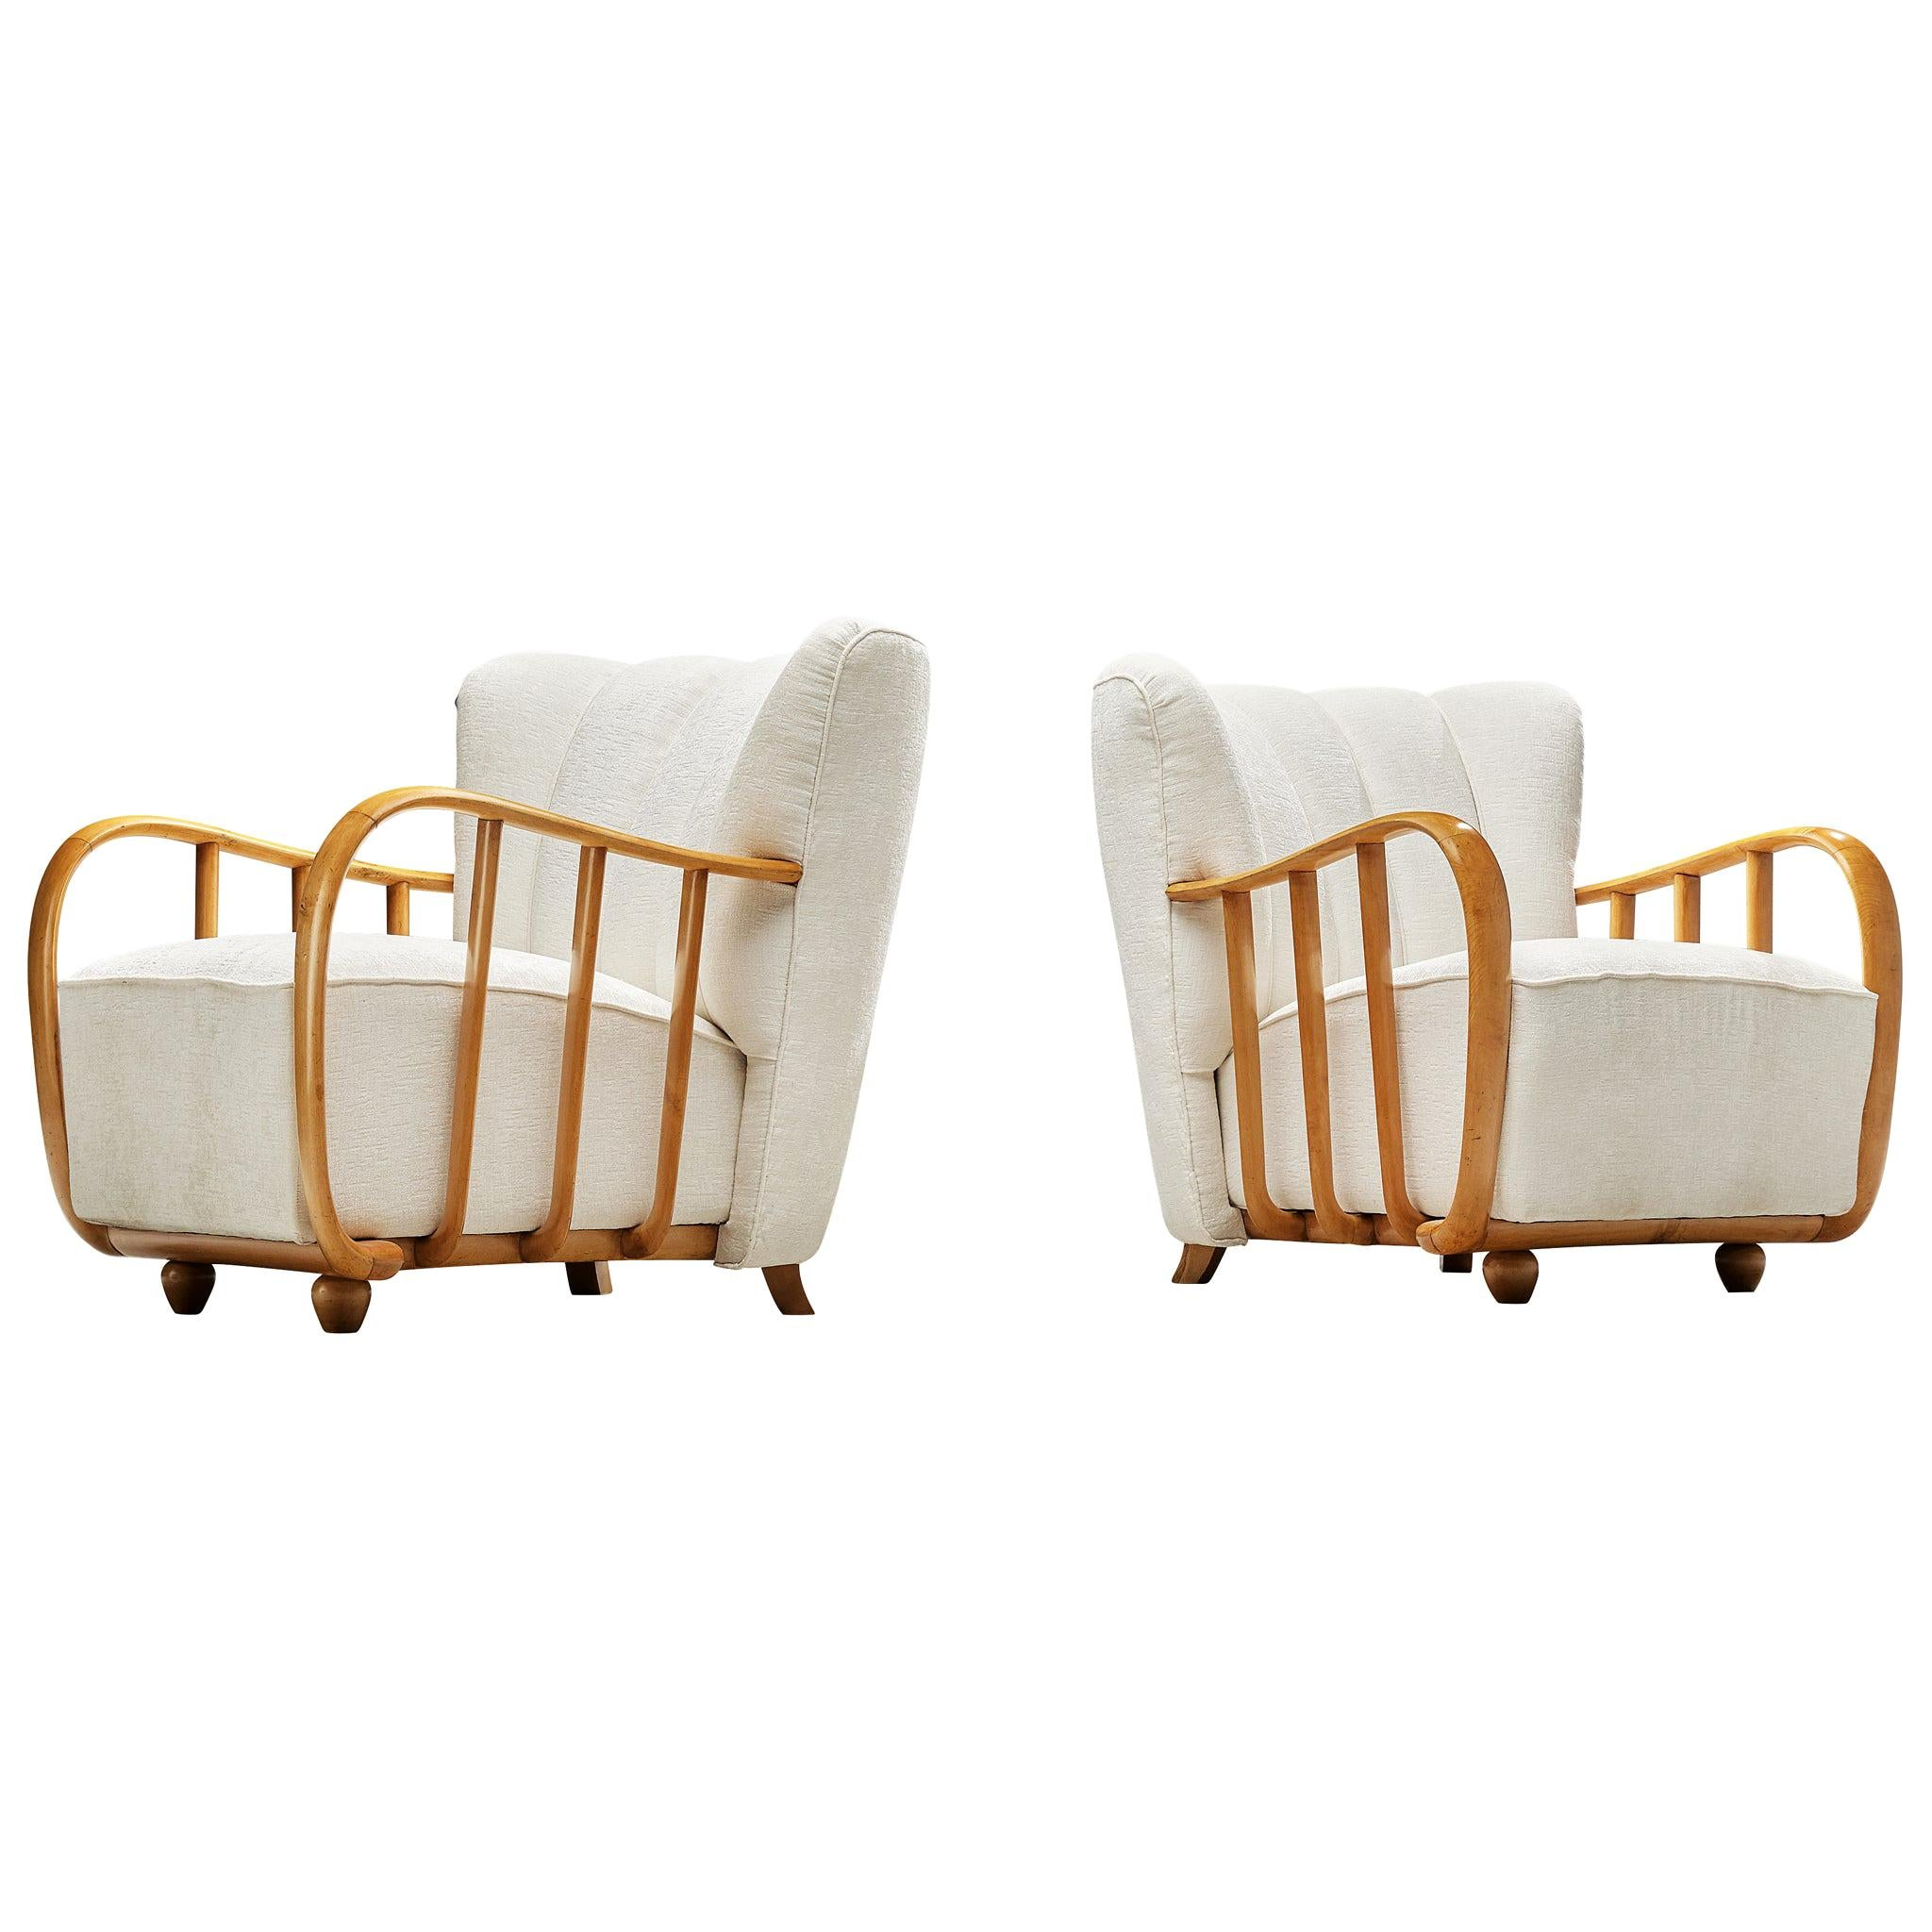 Pair of Italian Art Deco Lounge Chairs